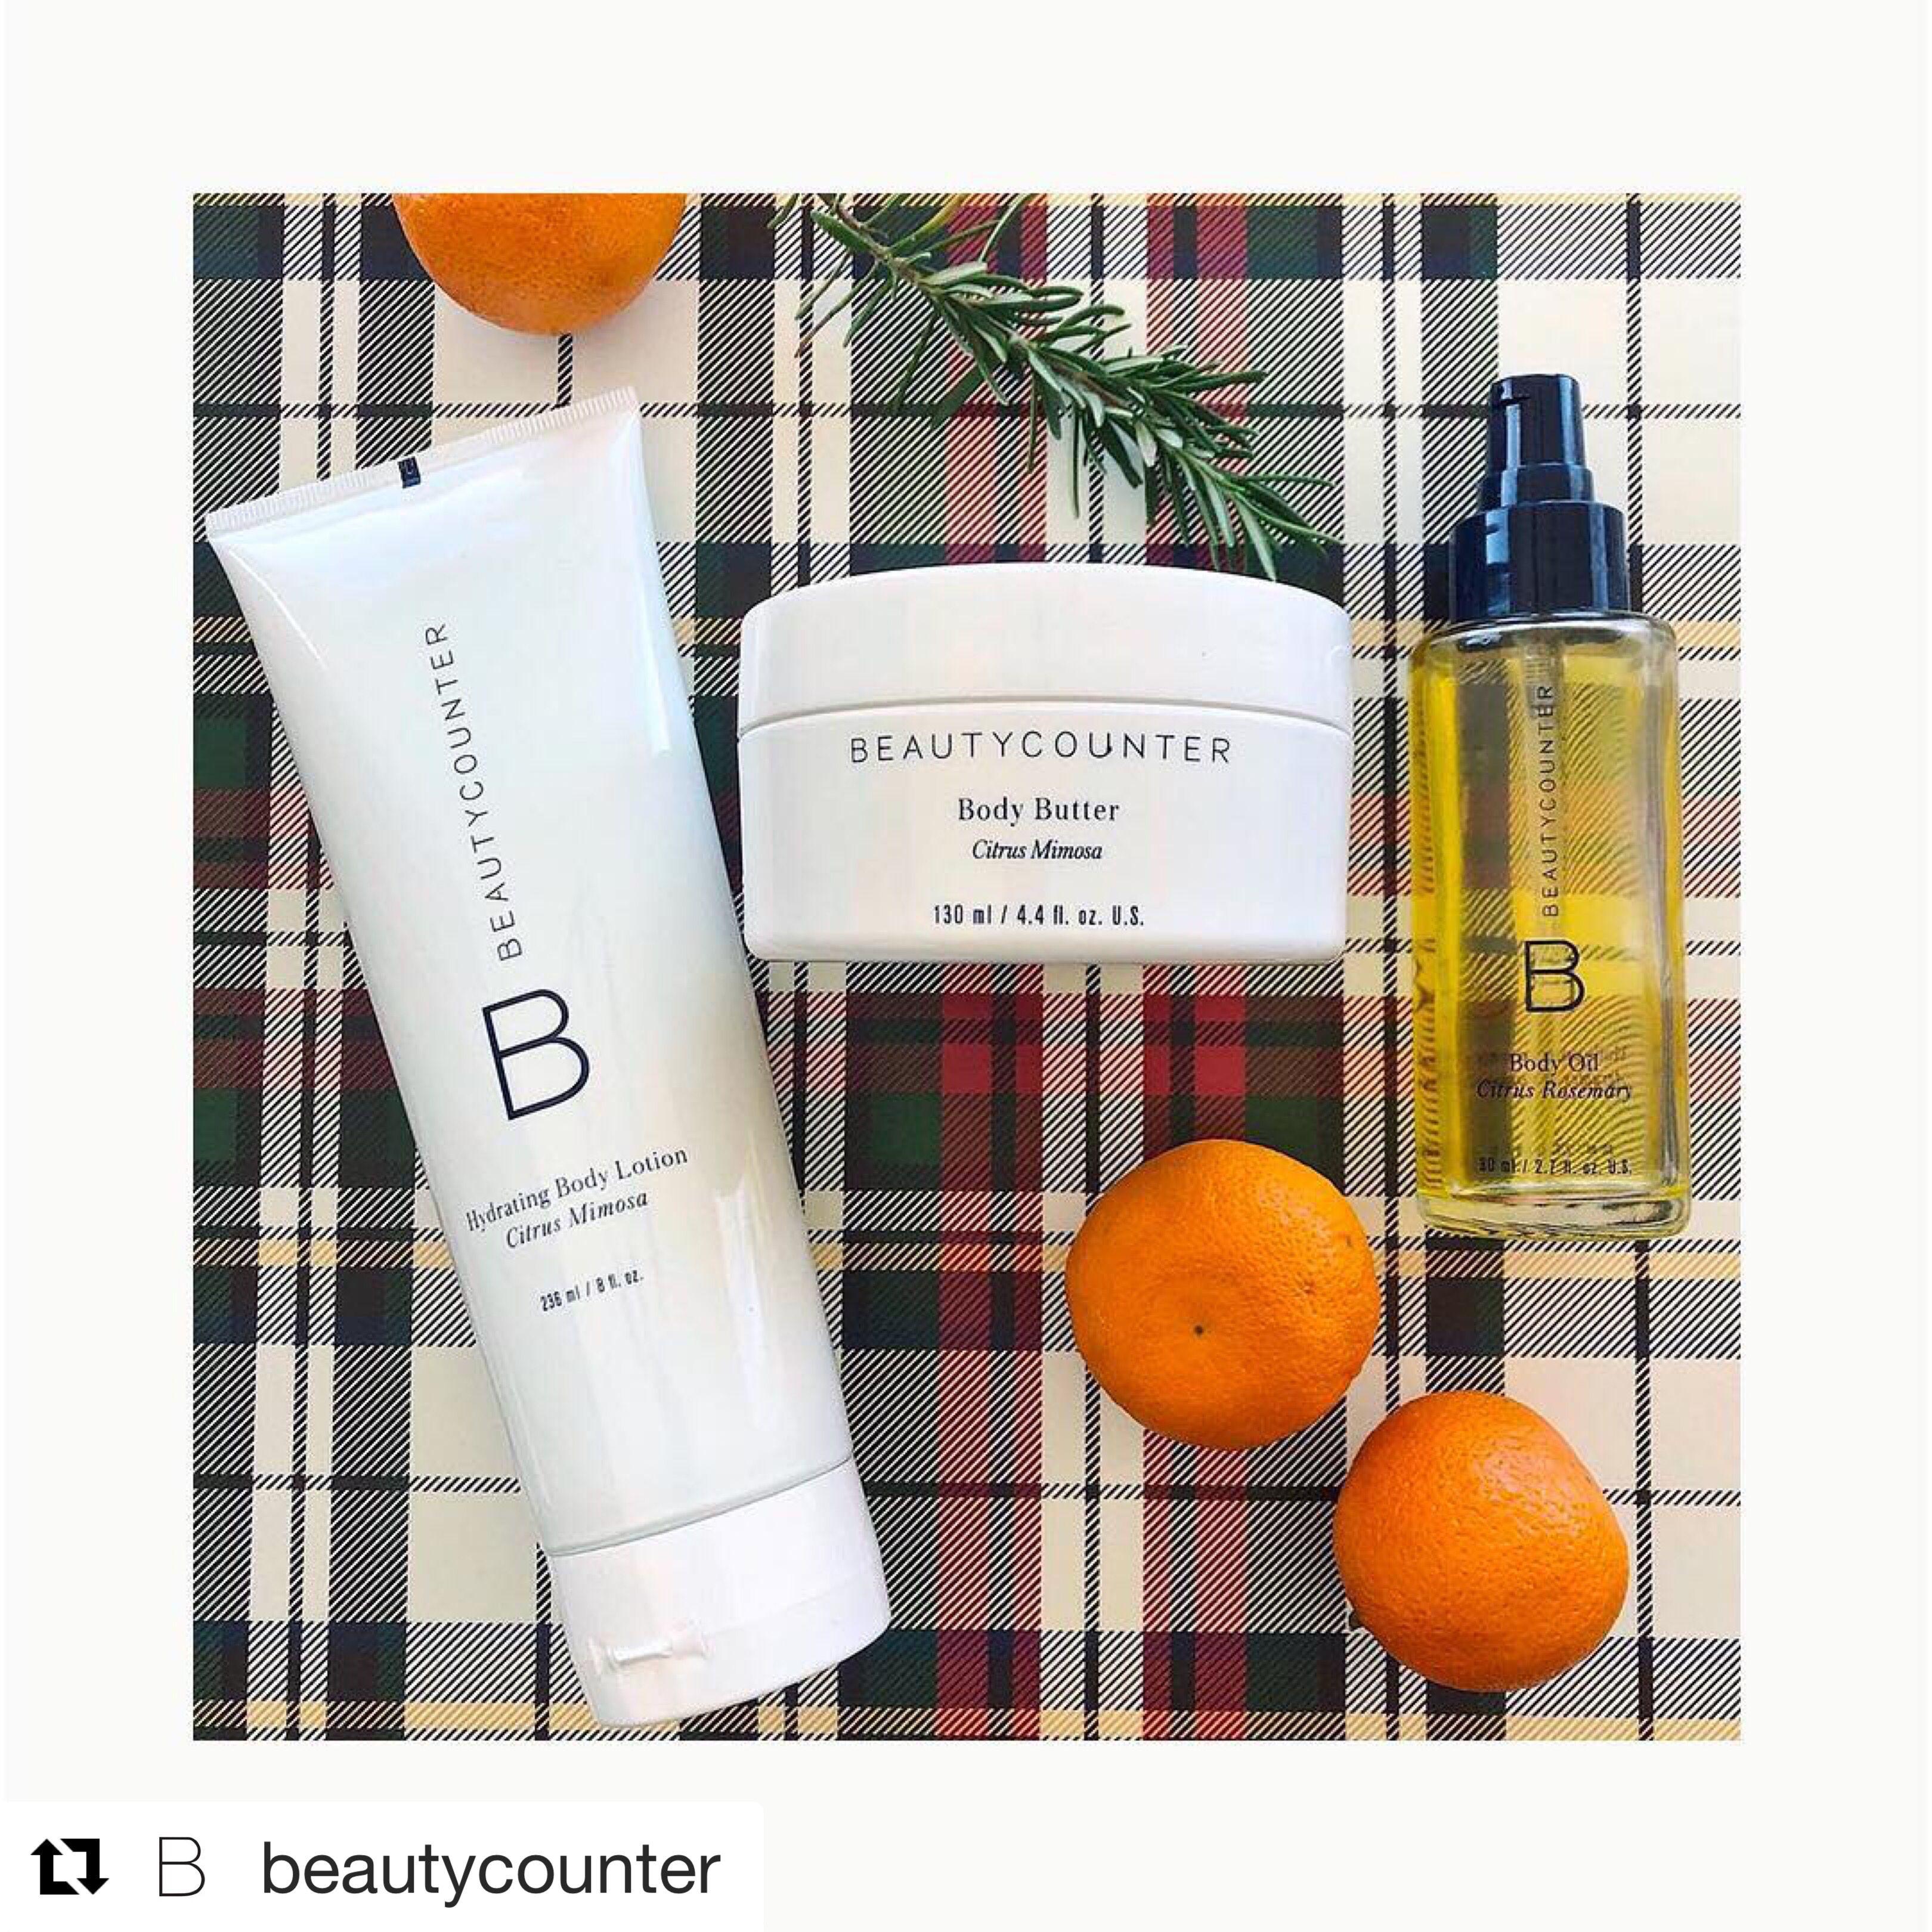 betterbeauty moisturizers blackfriday2018